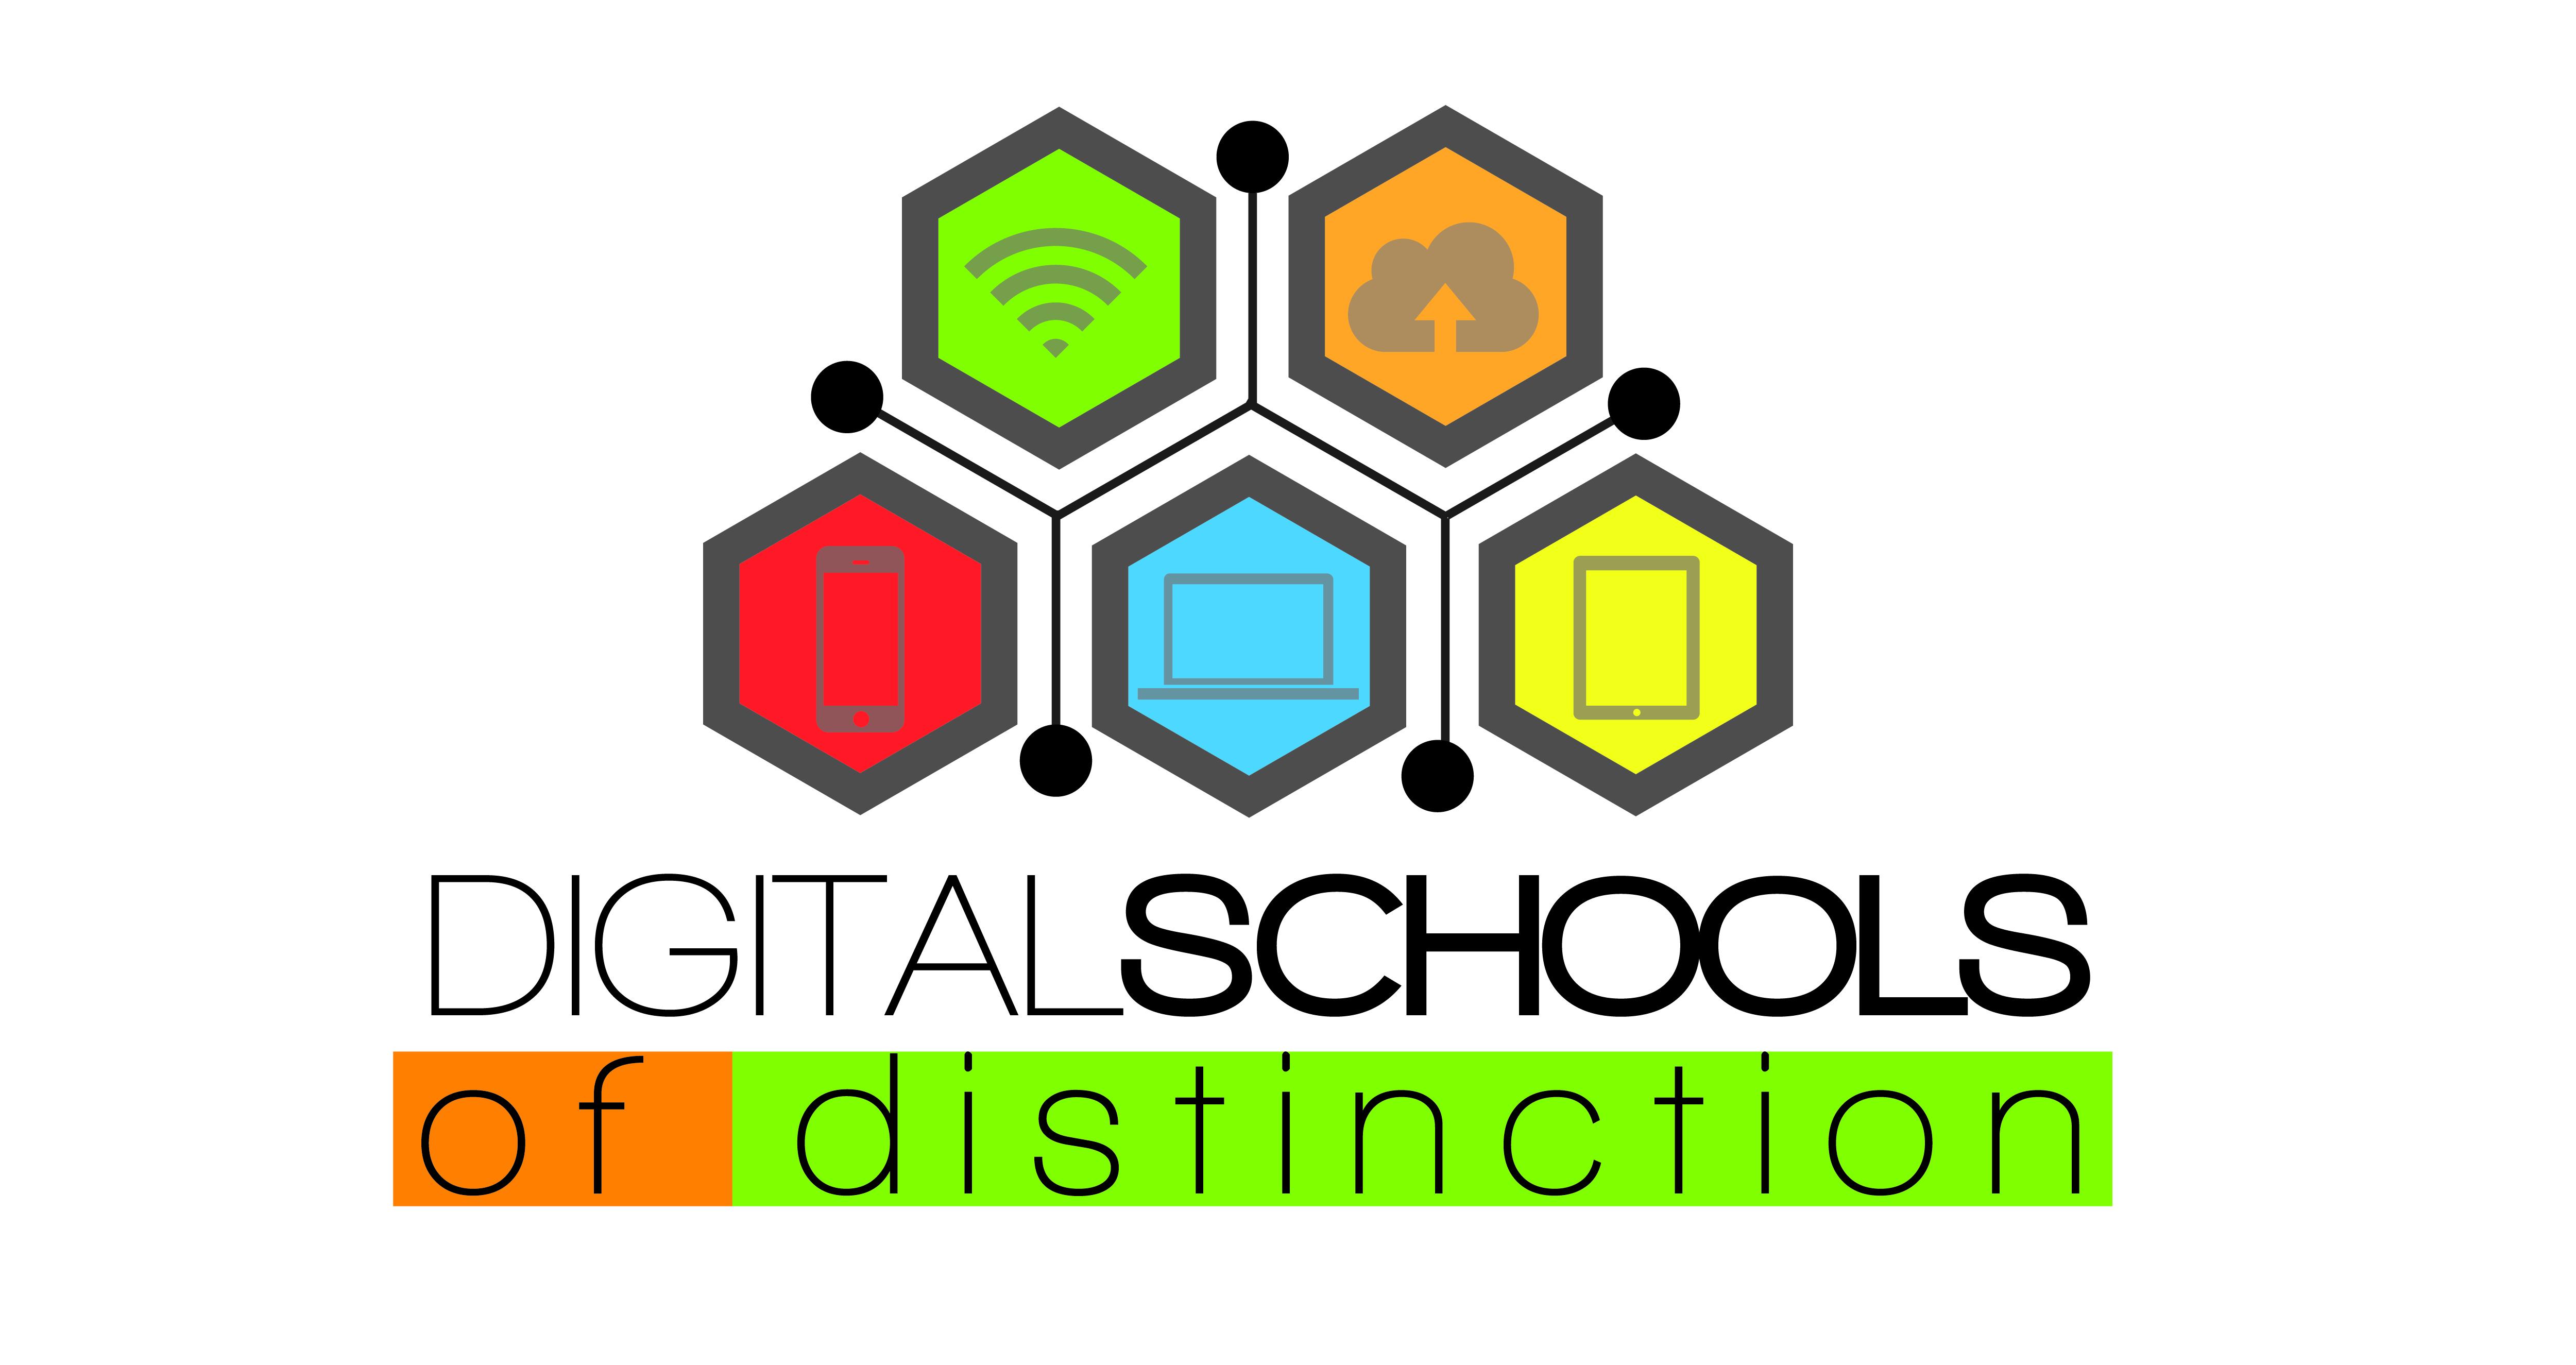 Digital School of Distinction